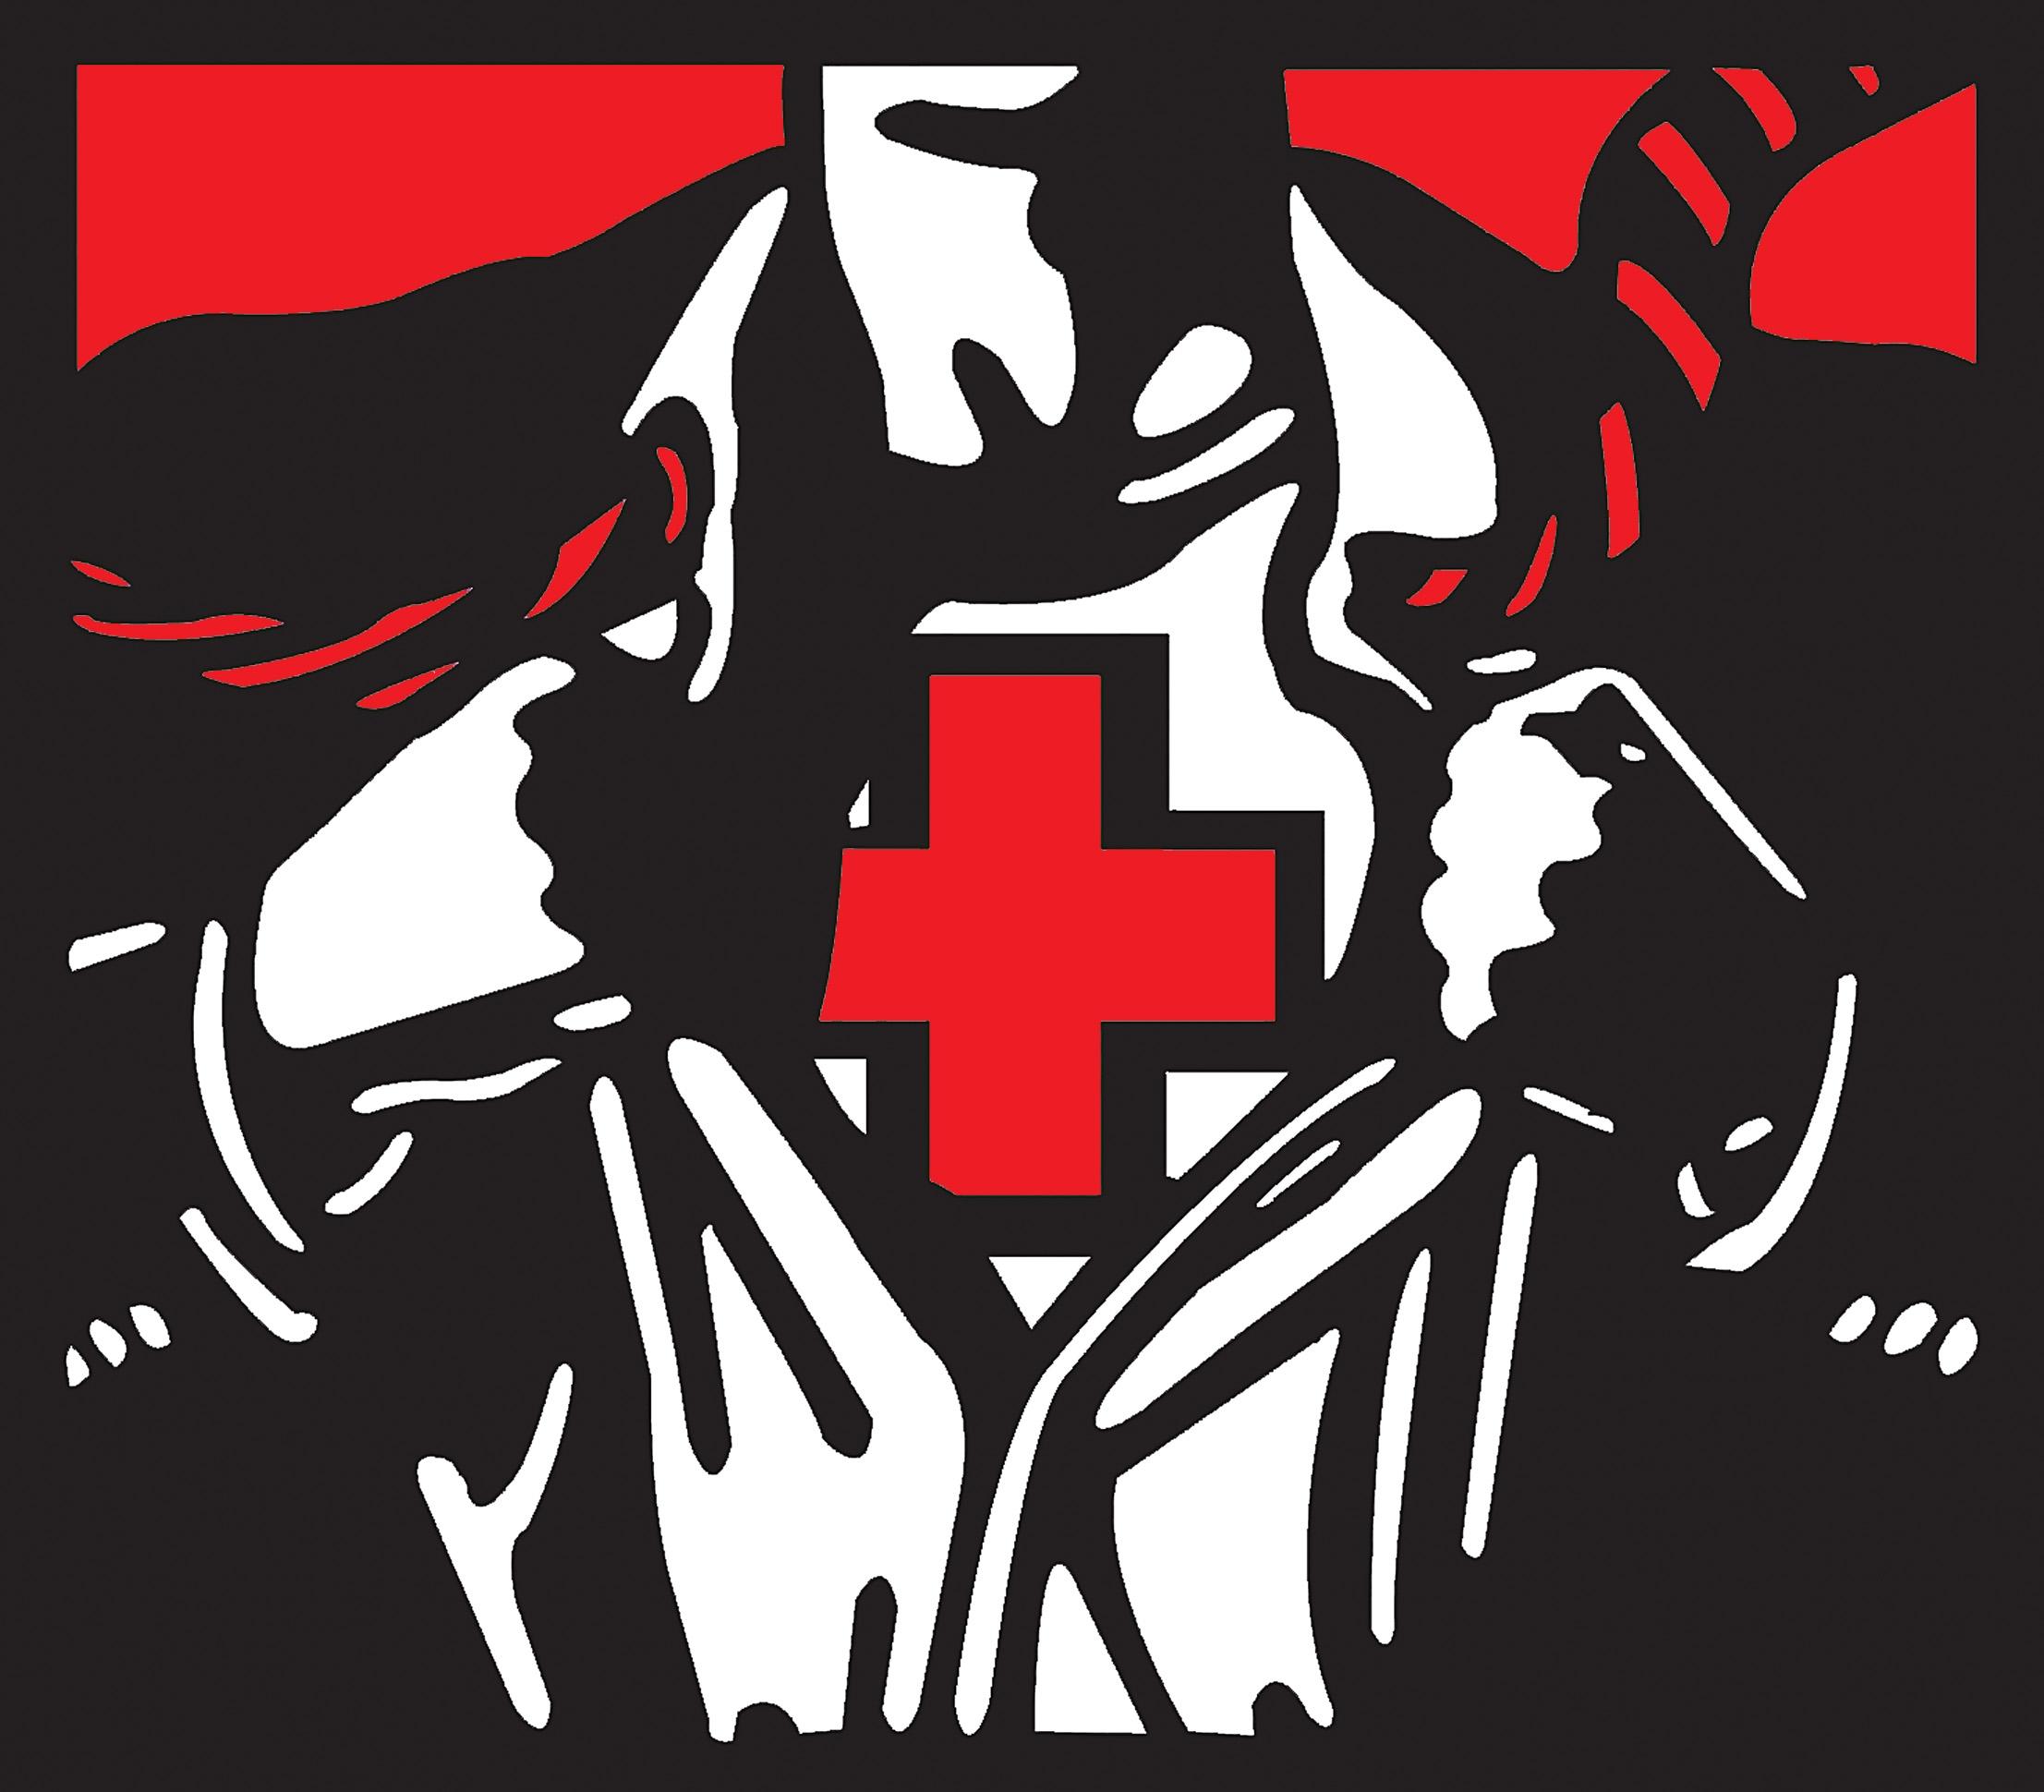 Volunteering In A Red Cross Emergency Shelter